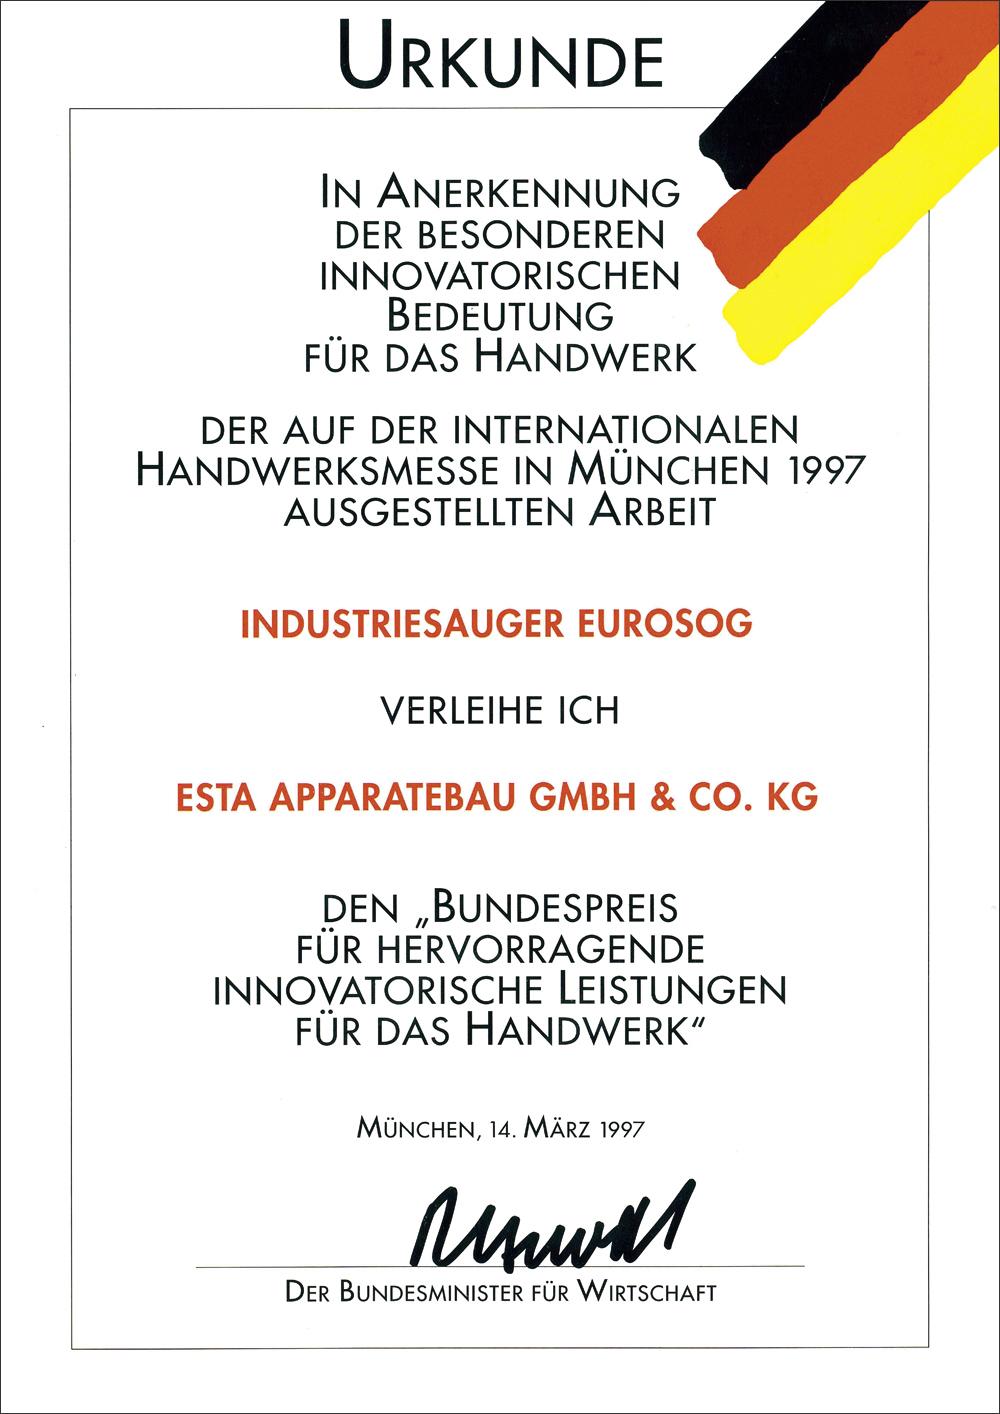 Urkunde für den Industriesauger EUROSOG.